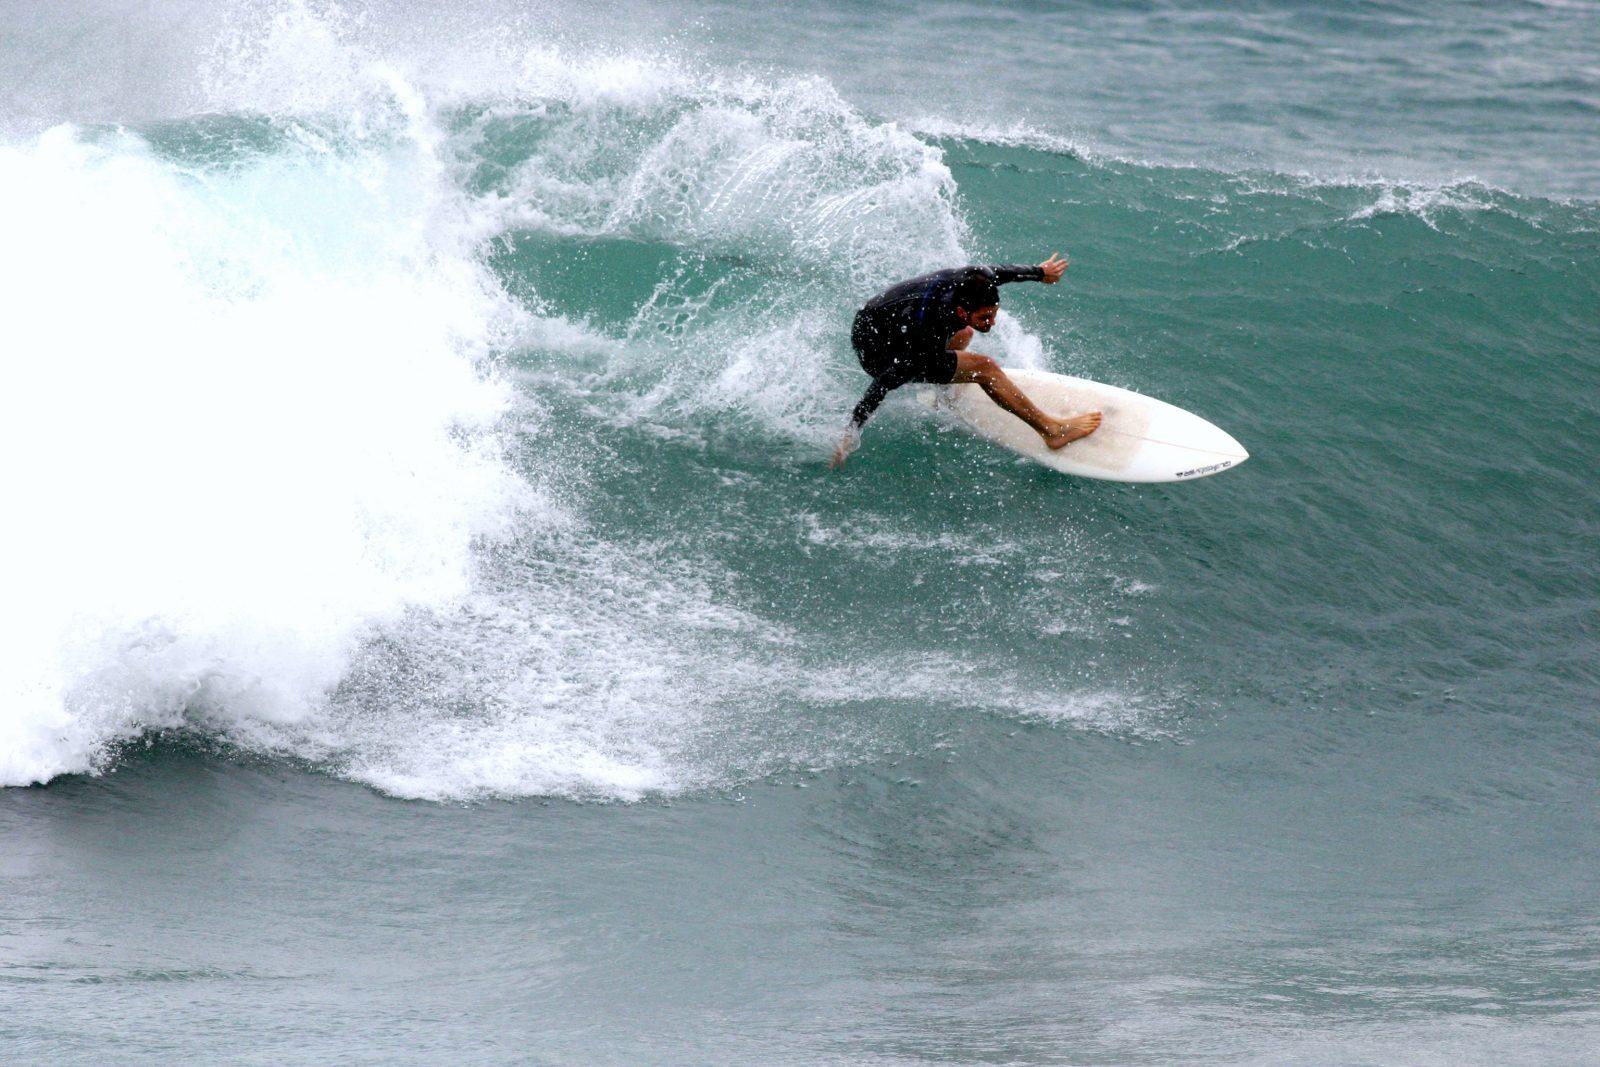 wagaligong-surf-hostel-dulan-chenggong2-e1465160317164